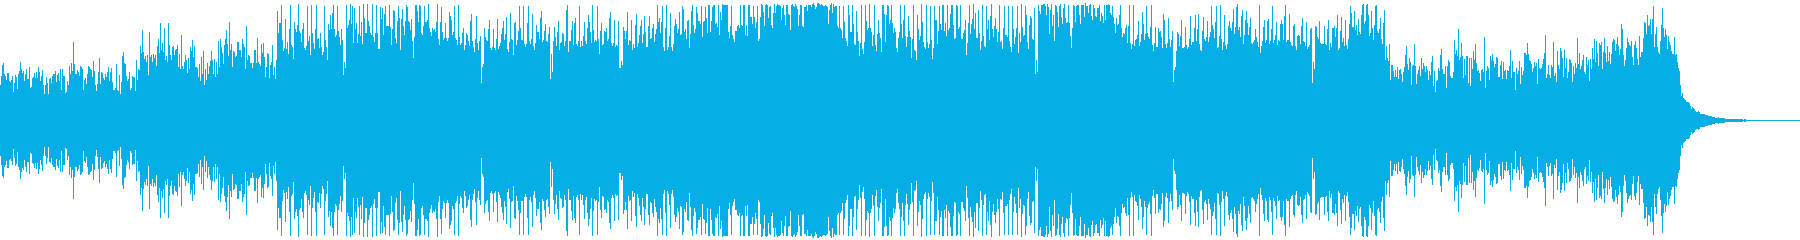 80'sディスコサウンド 2020verの再生済みの波形